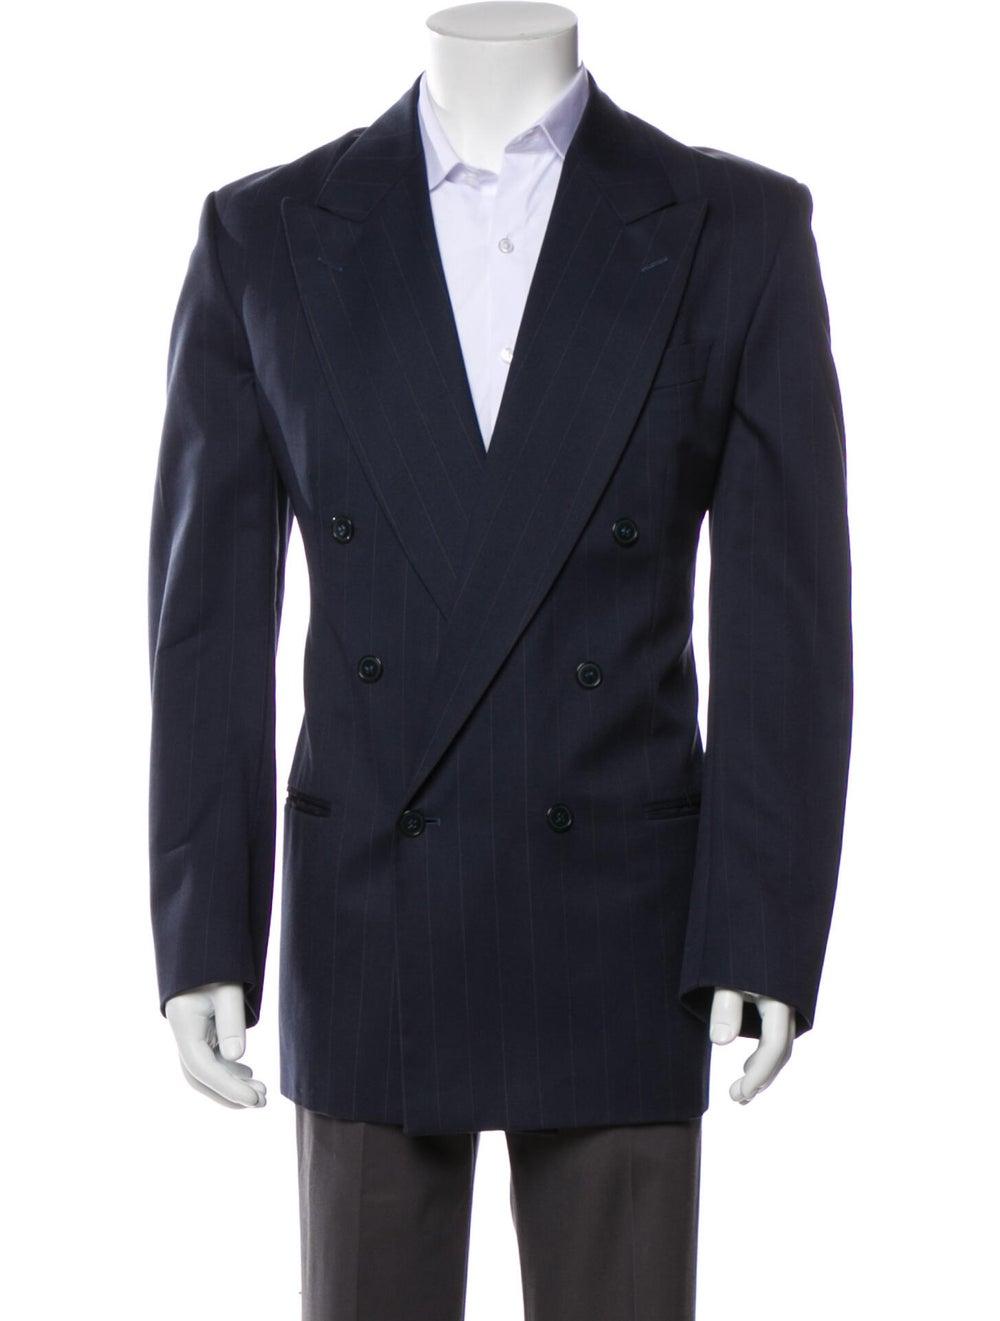 Yves Saint Laurent Vintage Wool Blazer Blue - image 1